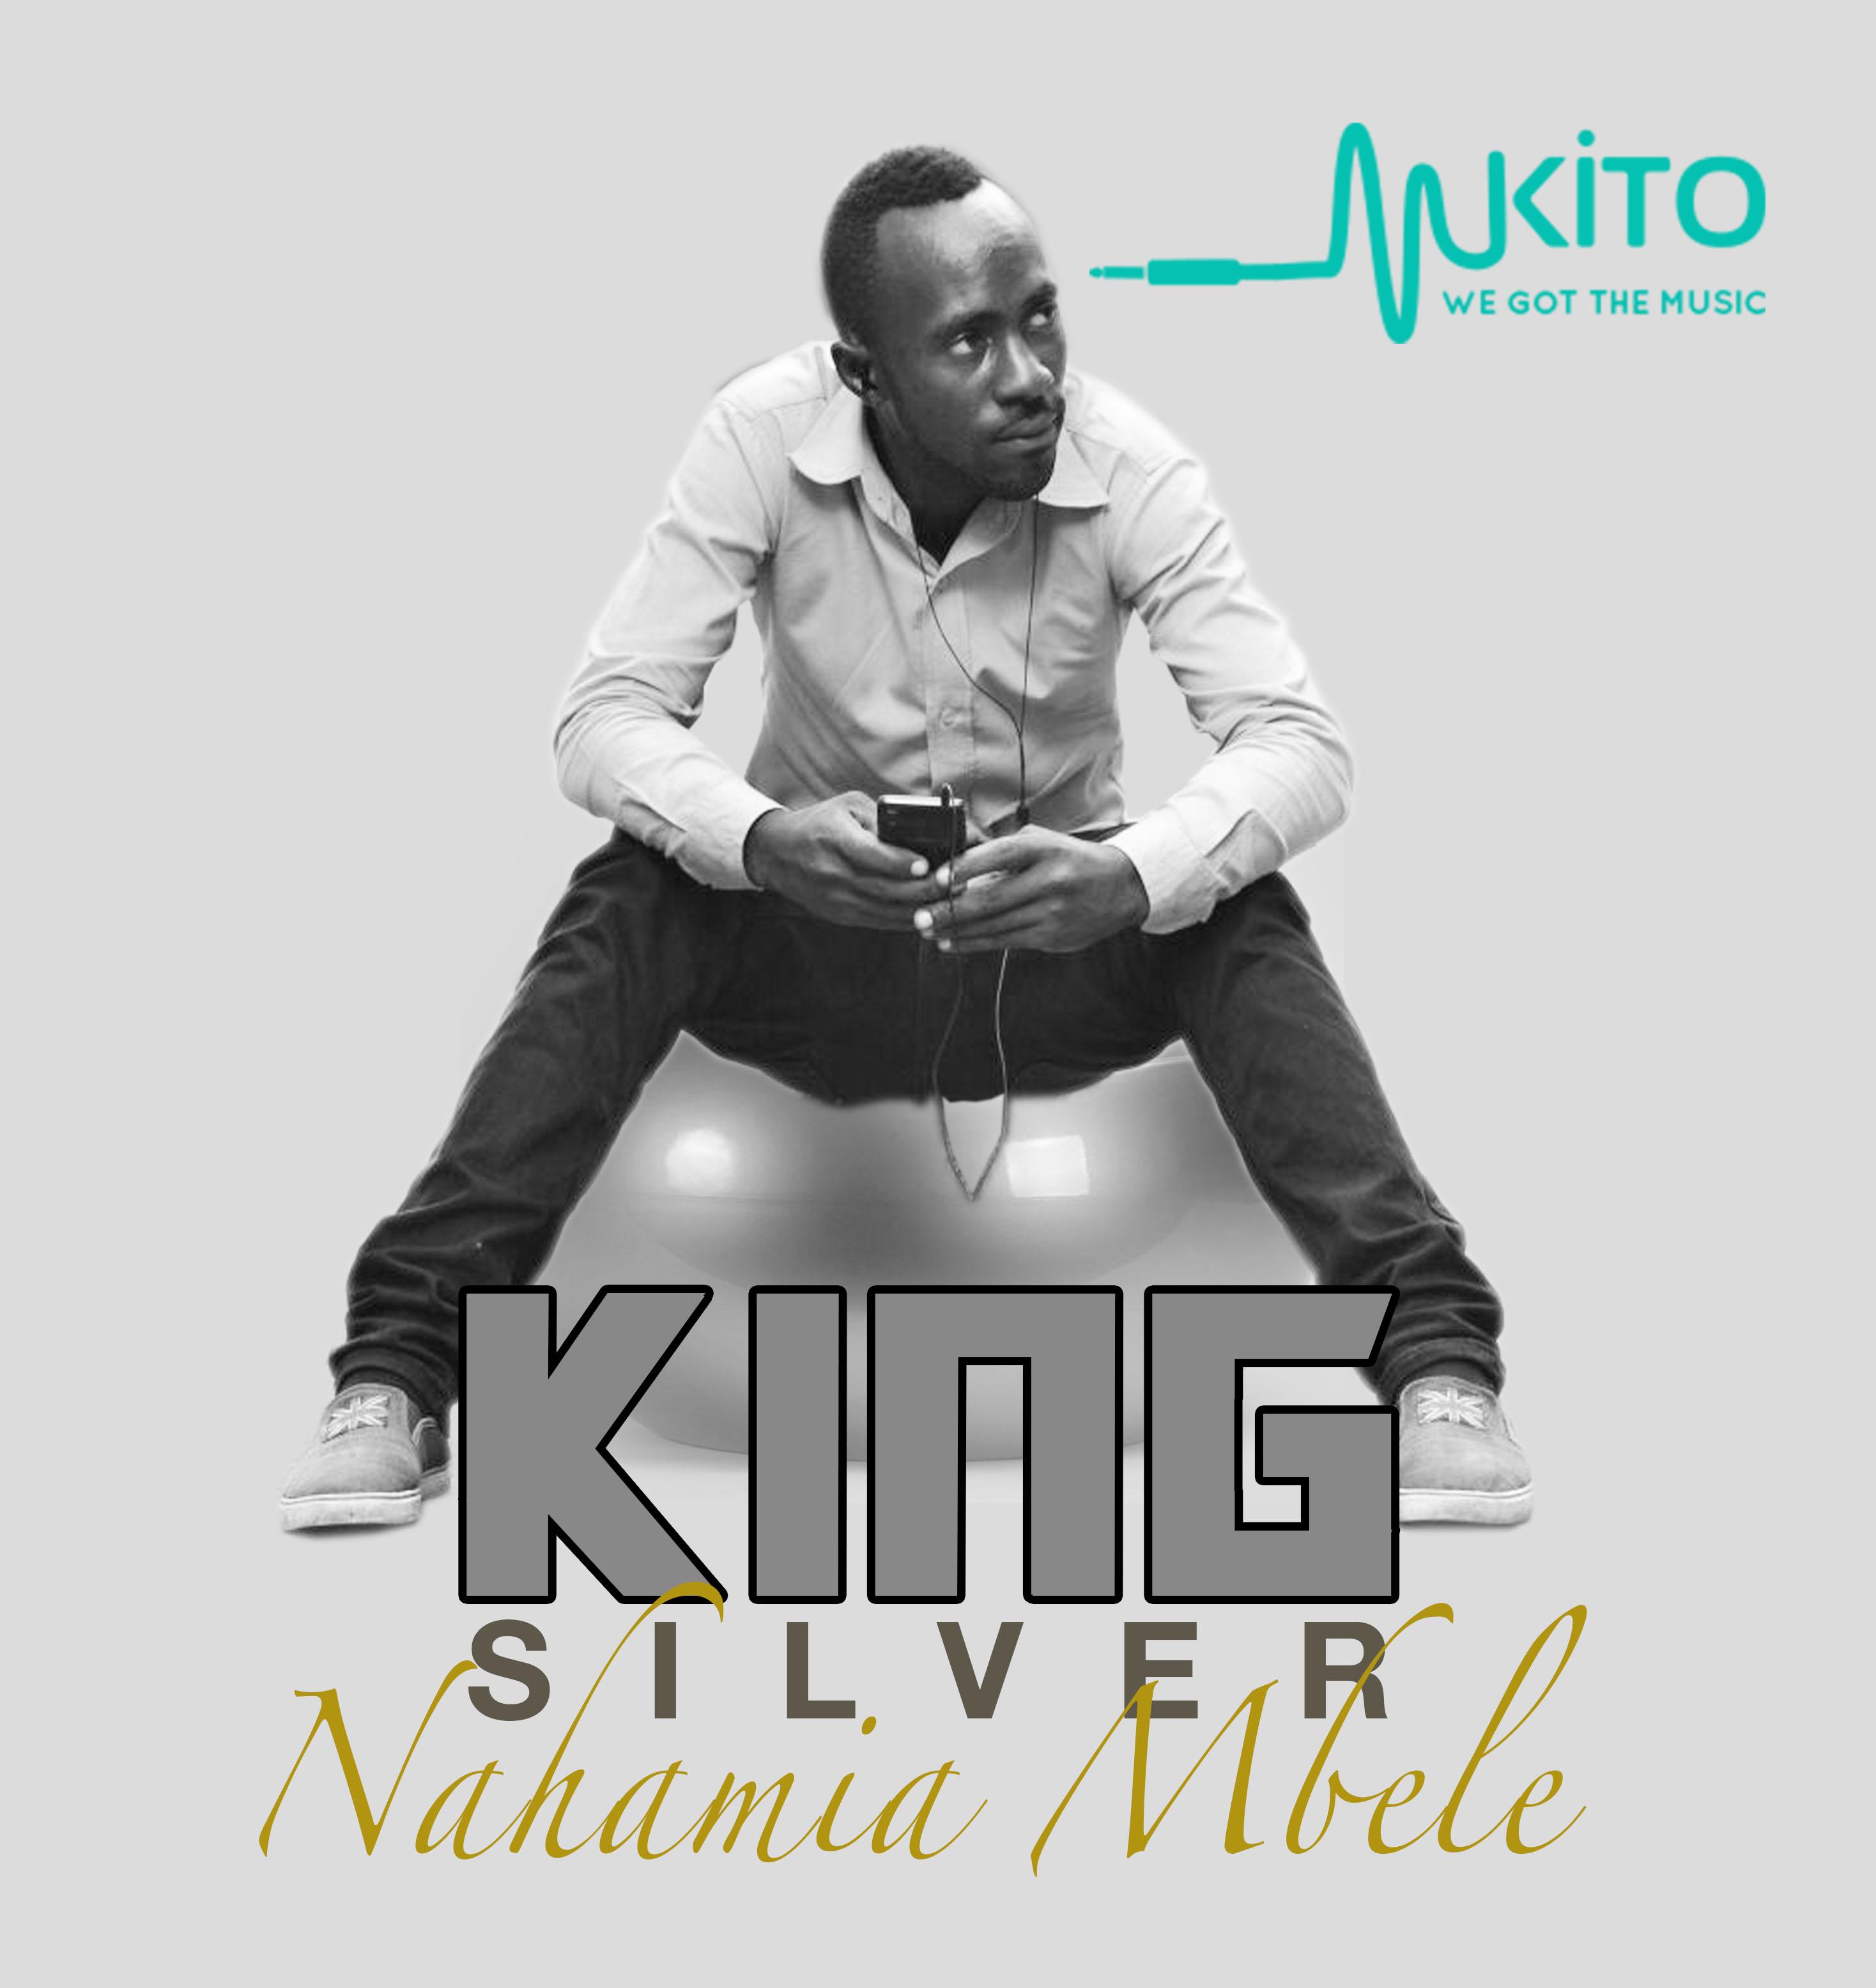 King silver - King silver -  Nahamia mbele